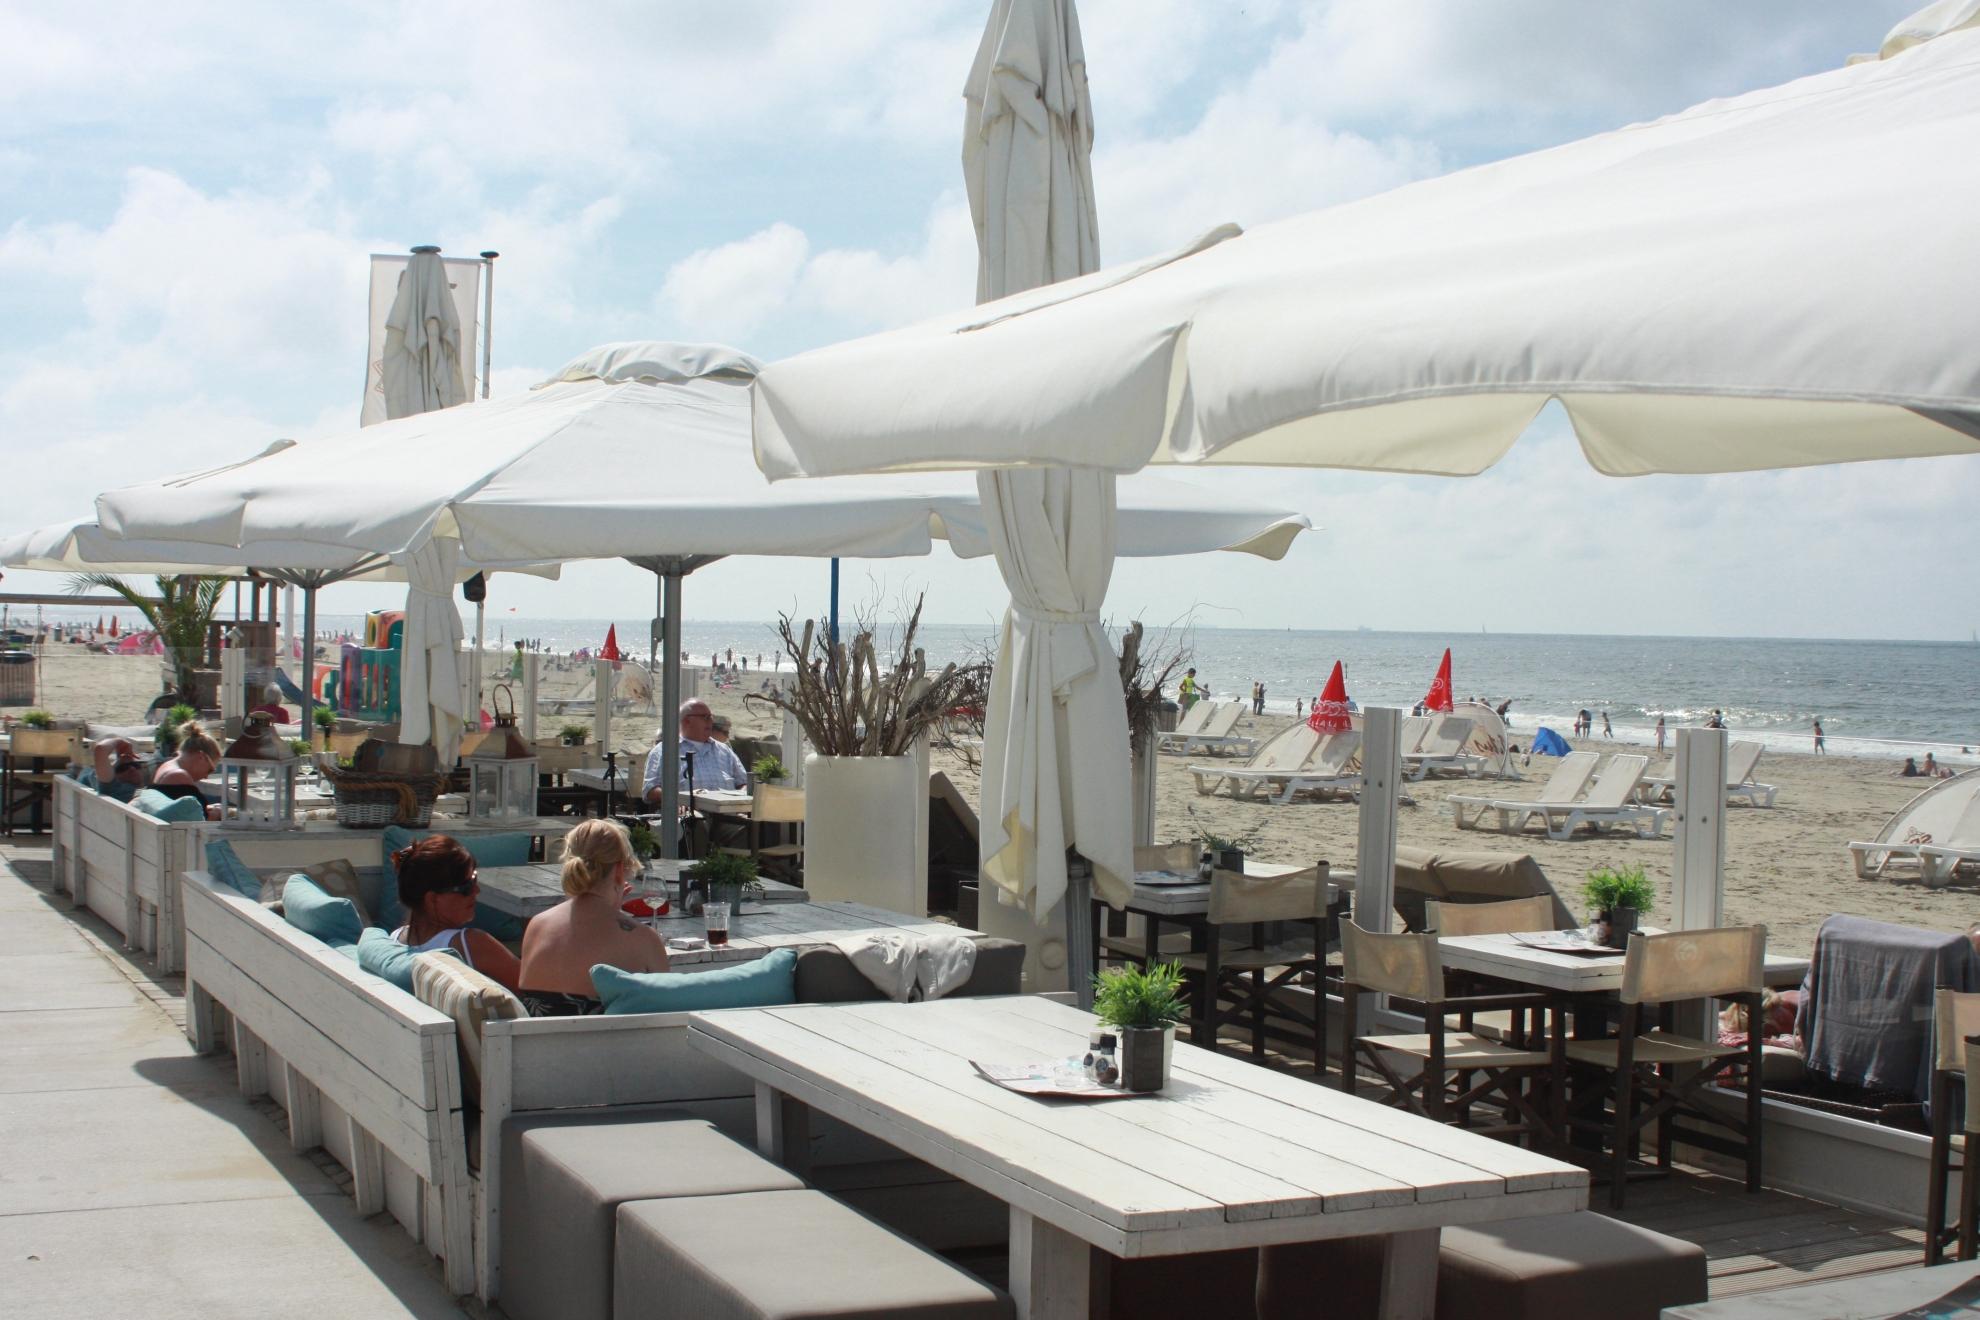 5 beachclub titus terras op het strand van kijkduin 73869 icon 1980x1320 - Parasol Karin 300x300